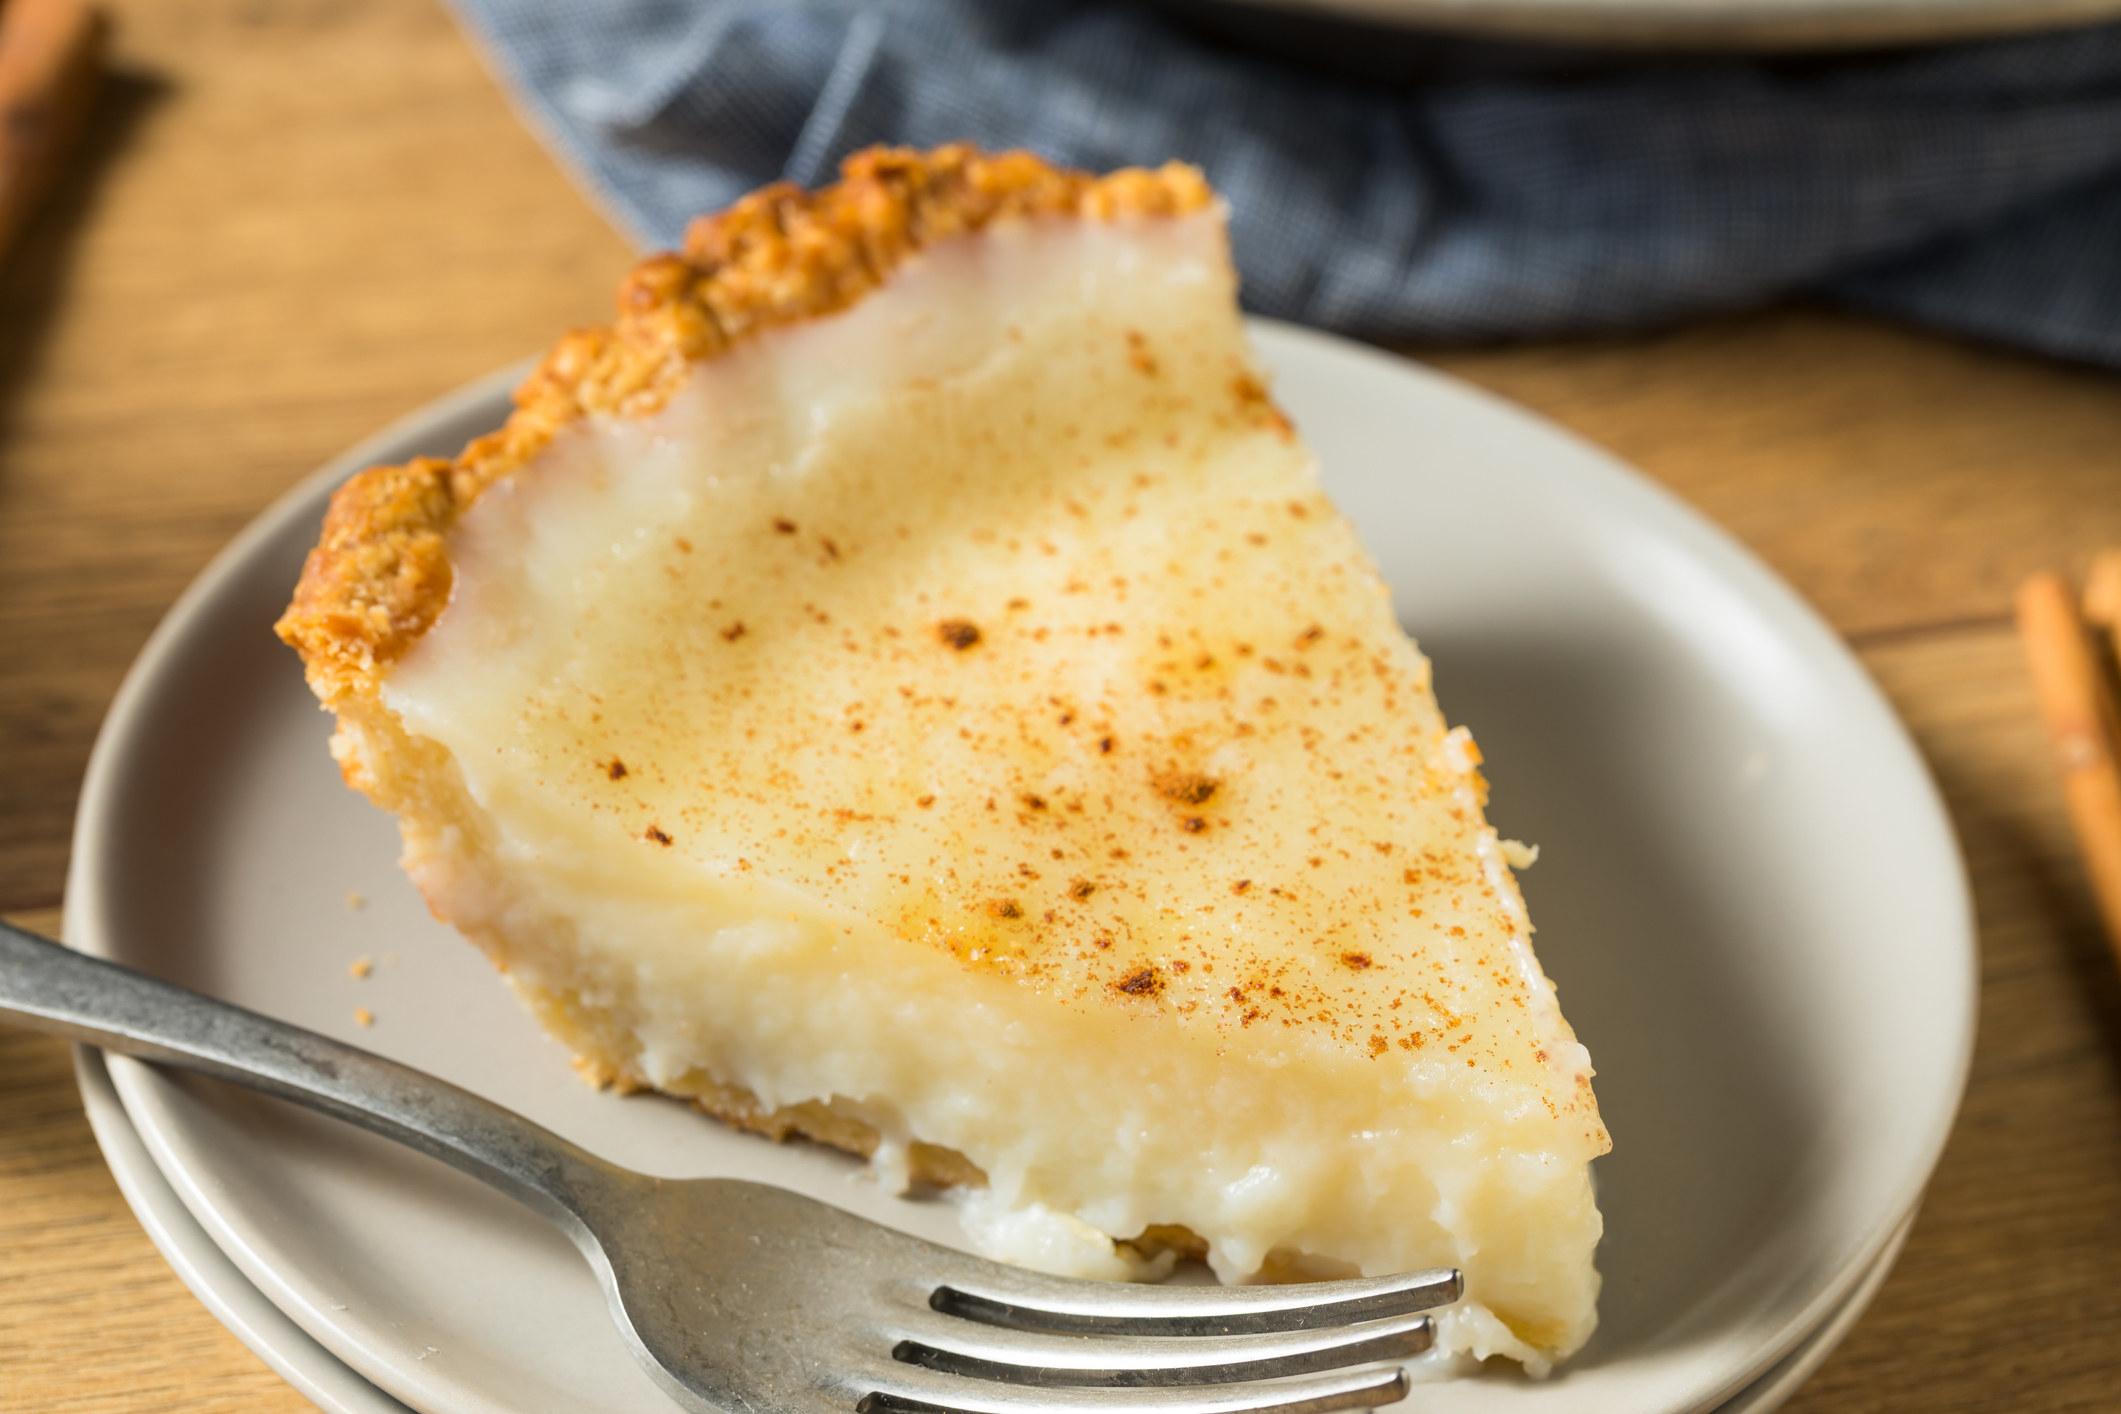 A slice of sugar cream pie.